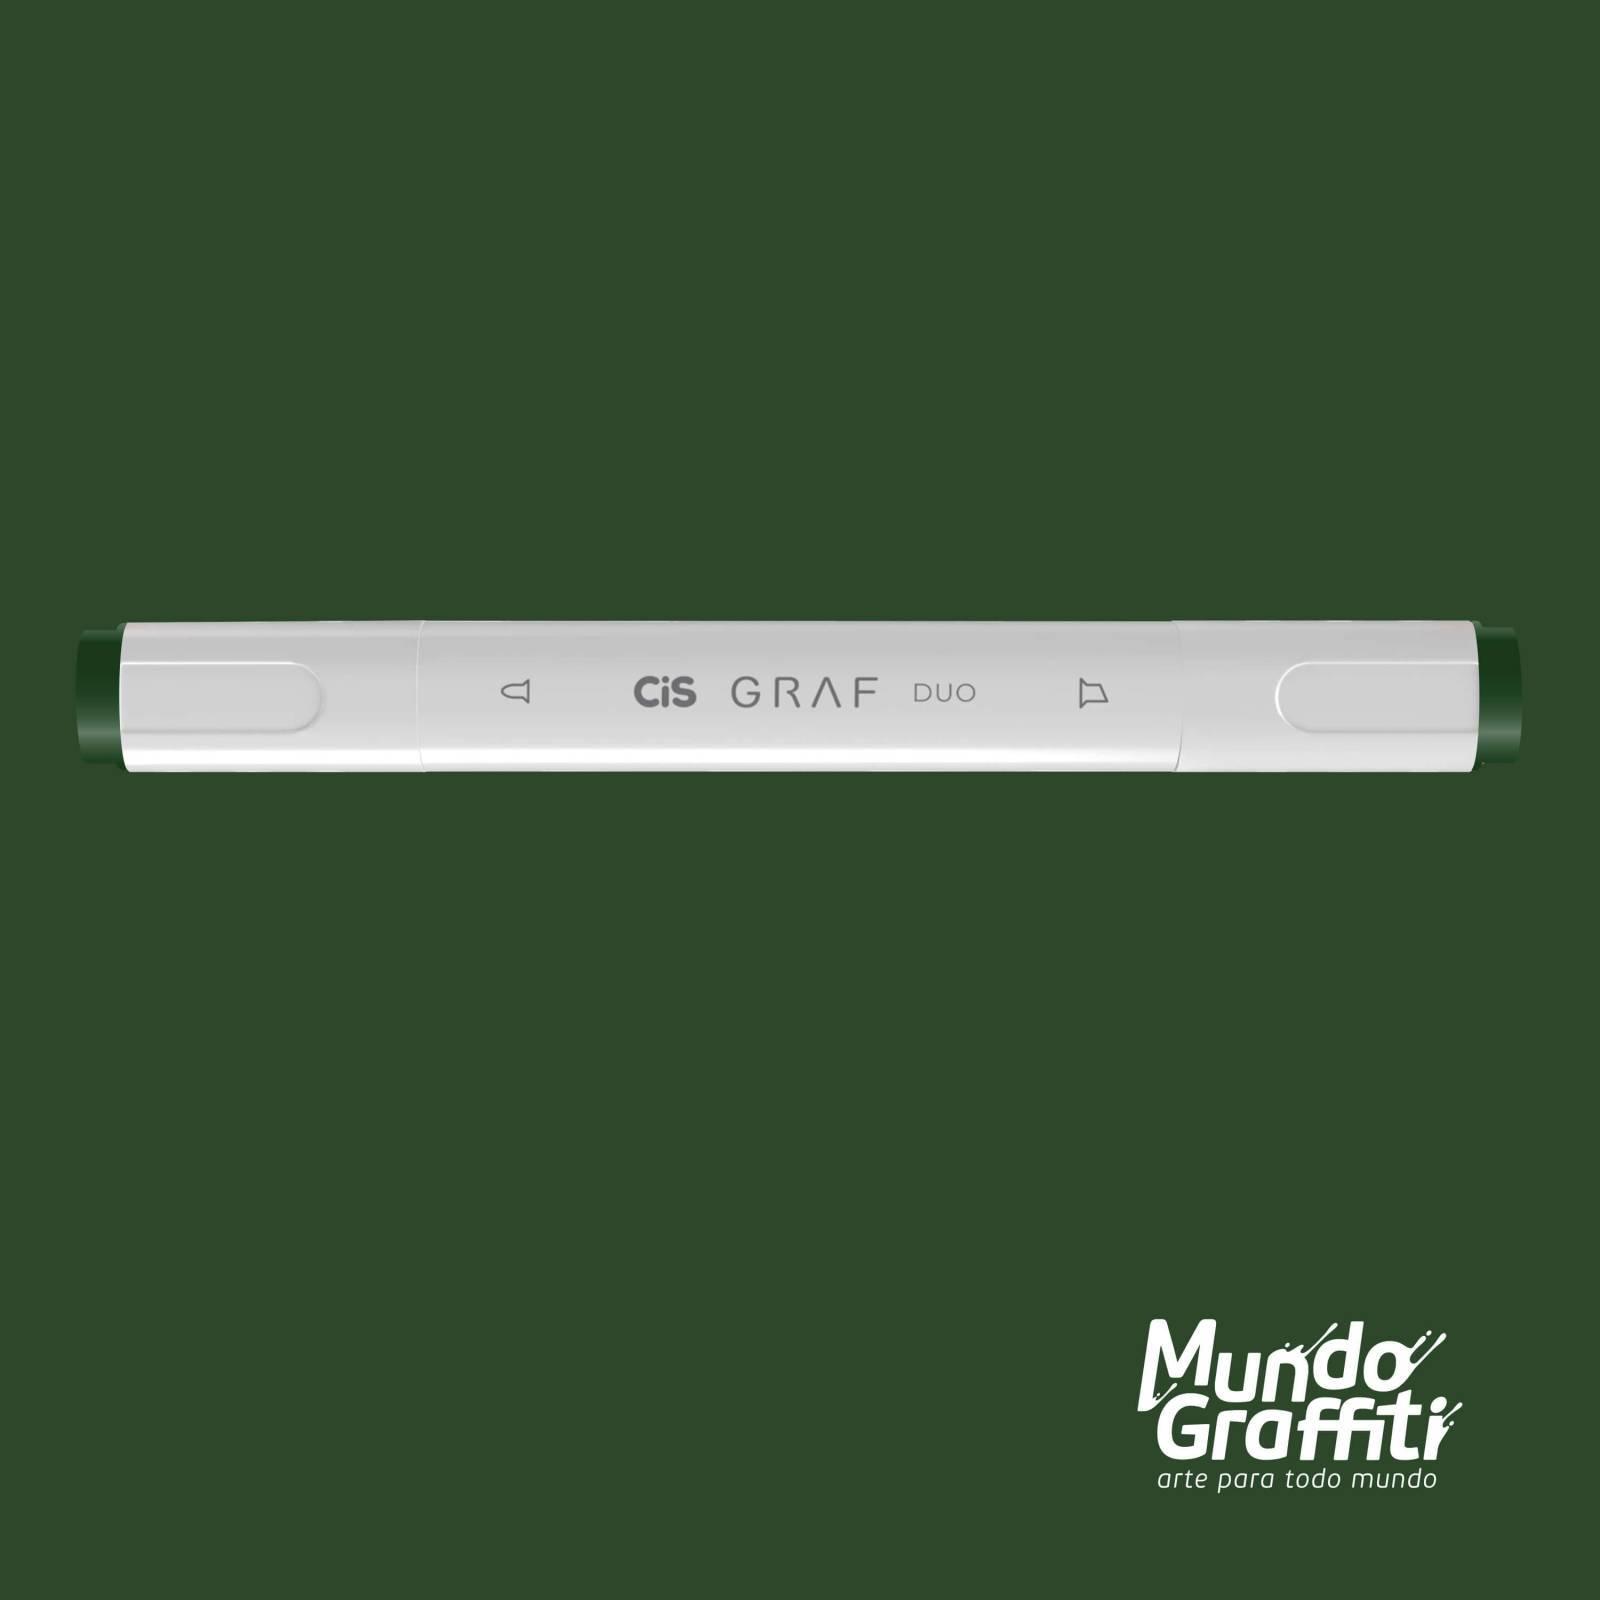 Marcador Cis Graf Duo Dark Green 51 - Mundo Graffiti